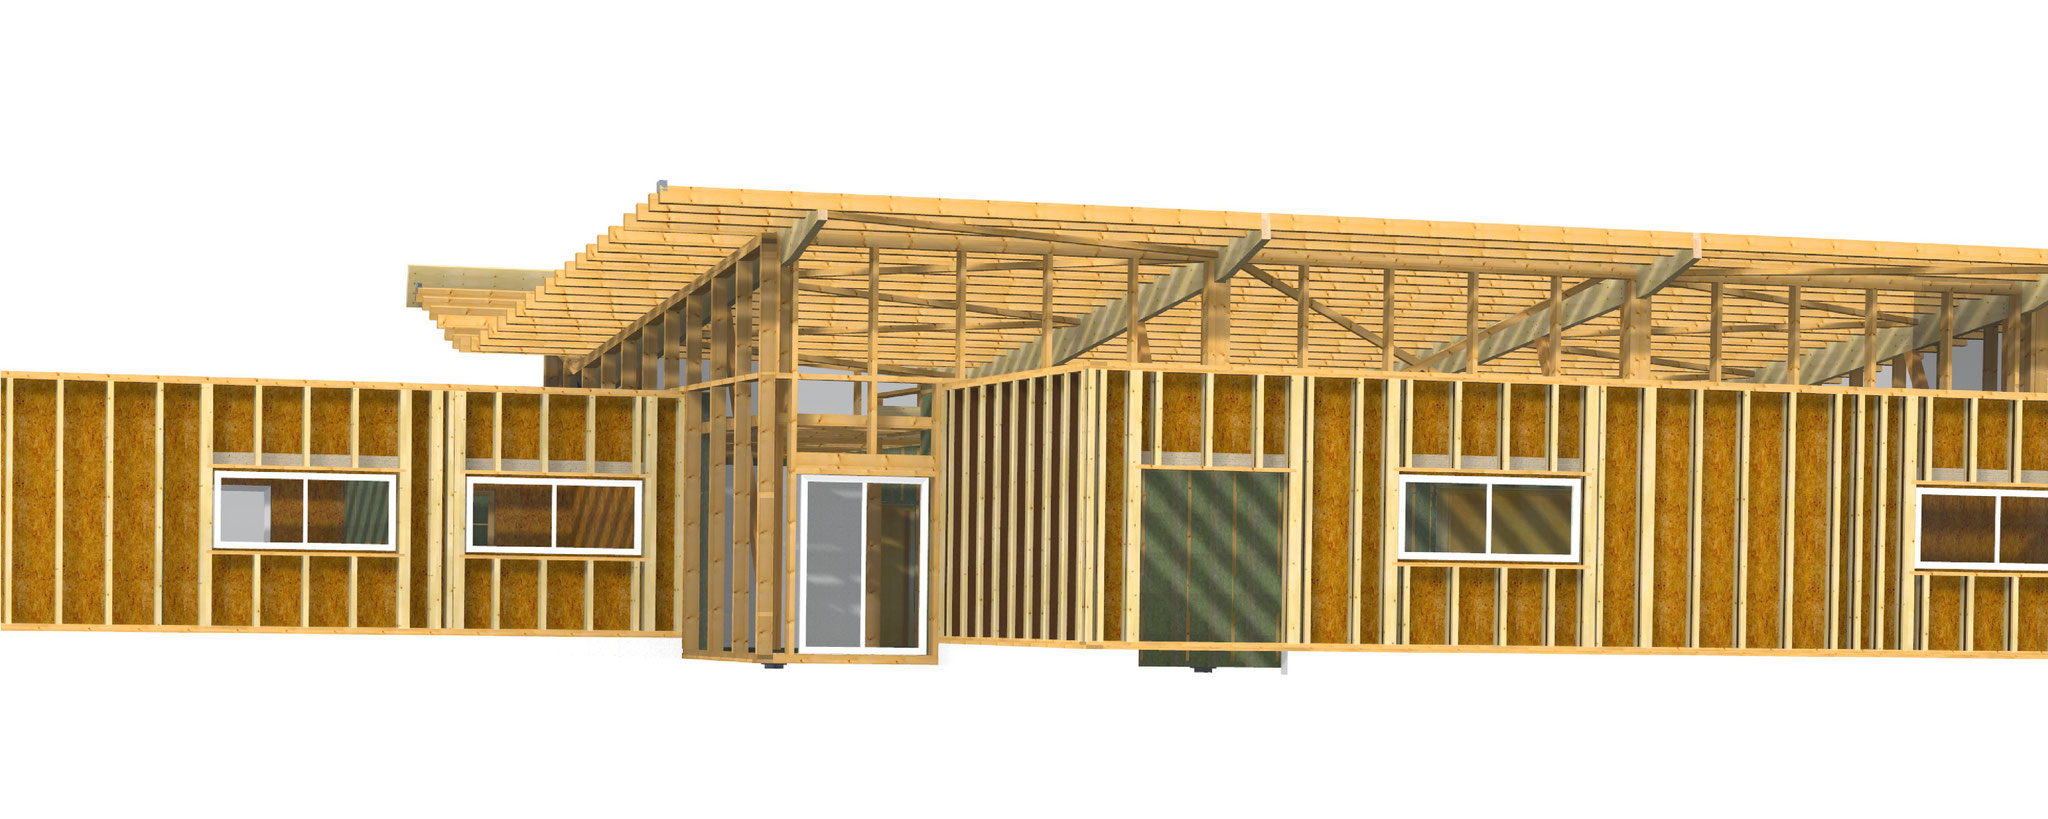 Dessin vue 3D - façade 2